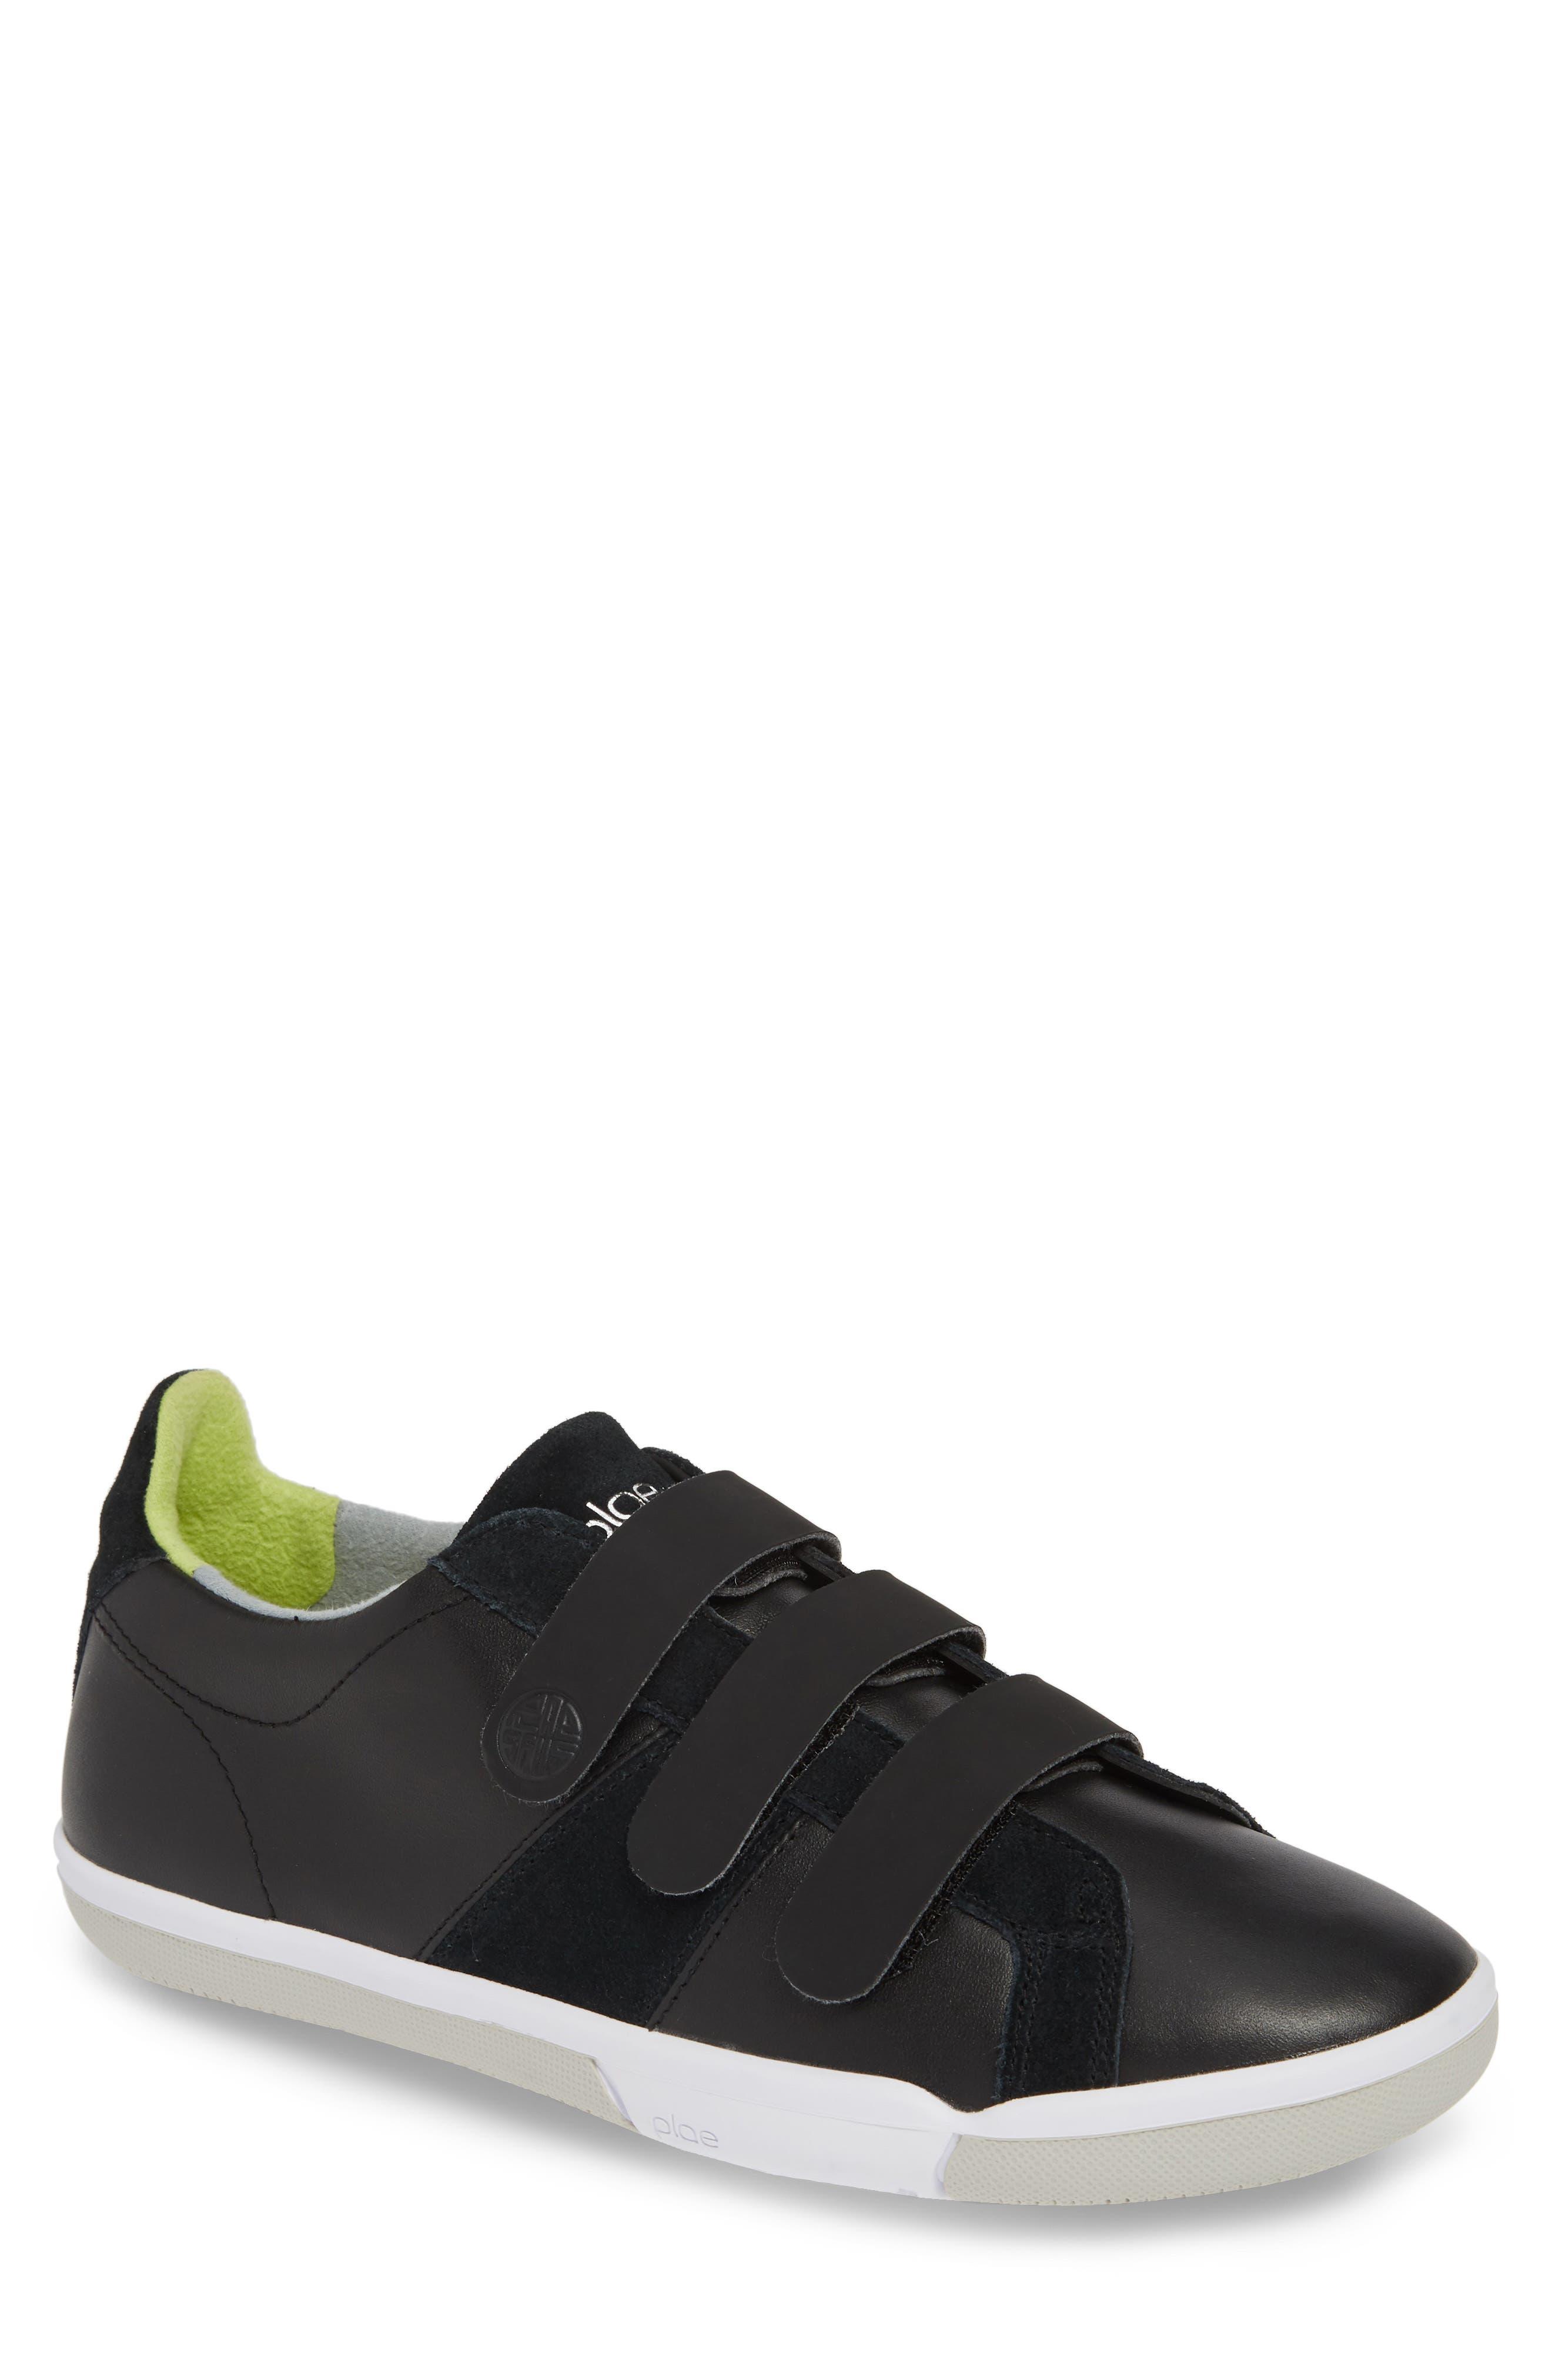 PLAE,                             Larkin Low Top Sneaker,                             Main thumbnail 1, color,                             BLACK LEATHER/ SUEDE